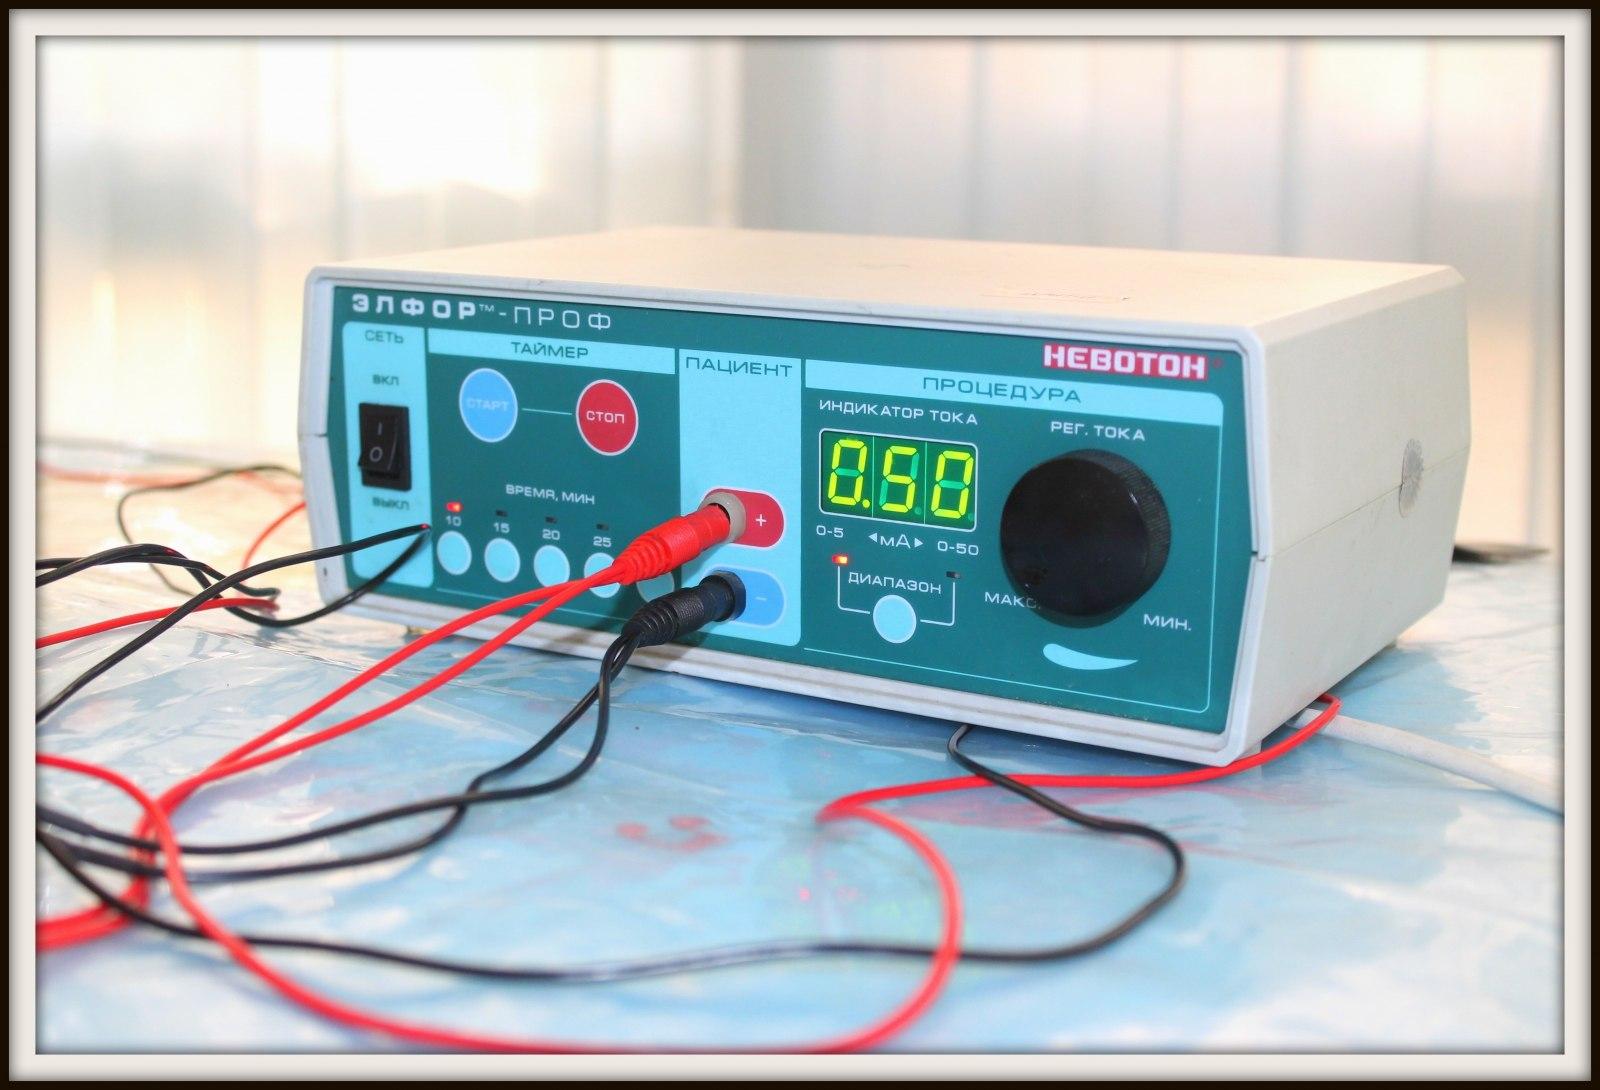 Электрофорез при дисплазии тазобедренного сустава у ребенка. Электрофорез при дисплазии тазобедренных суставов у детей